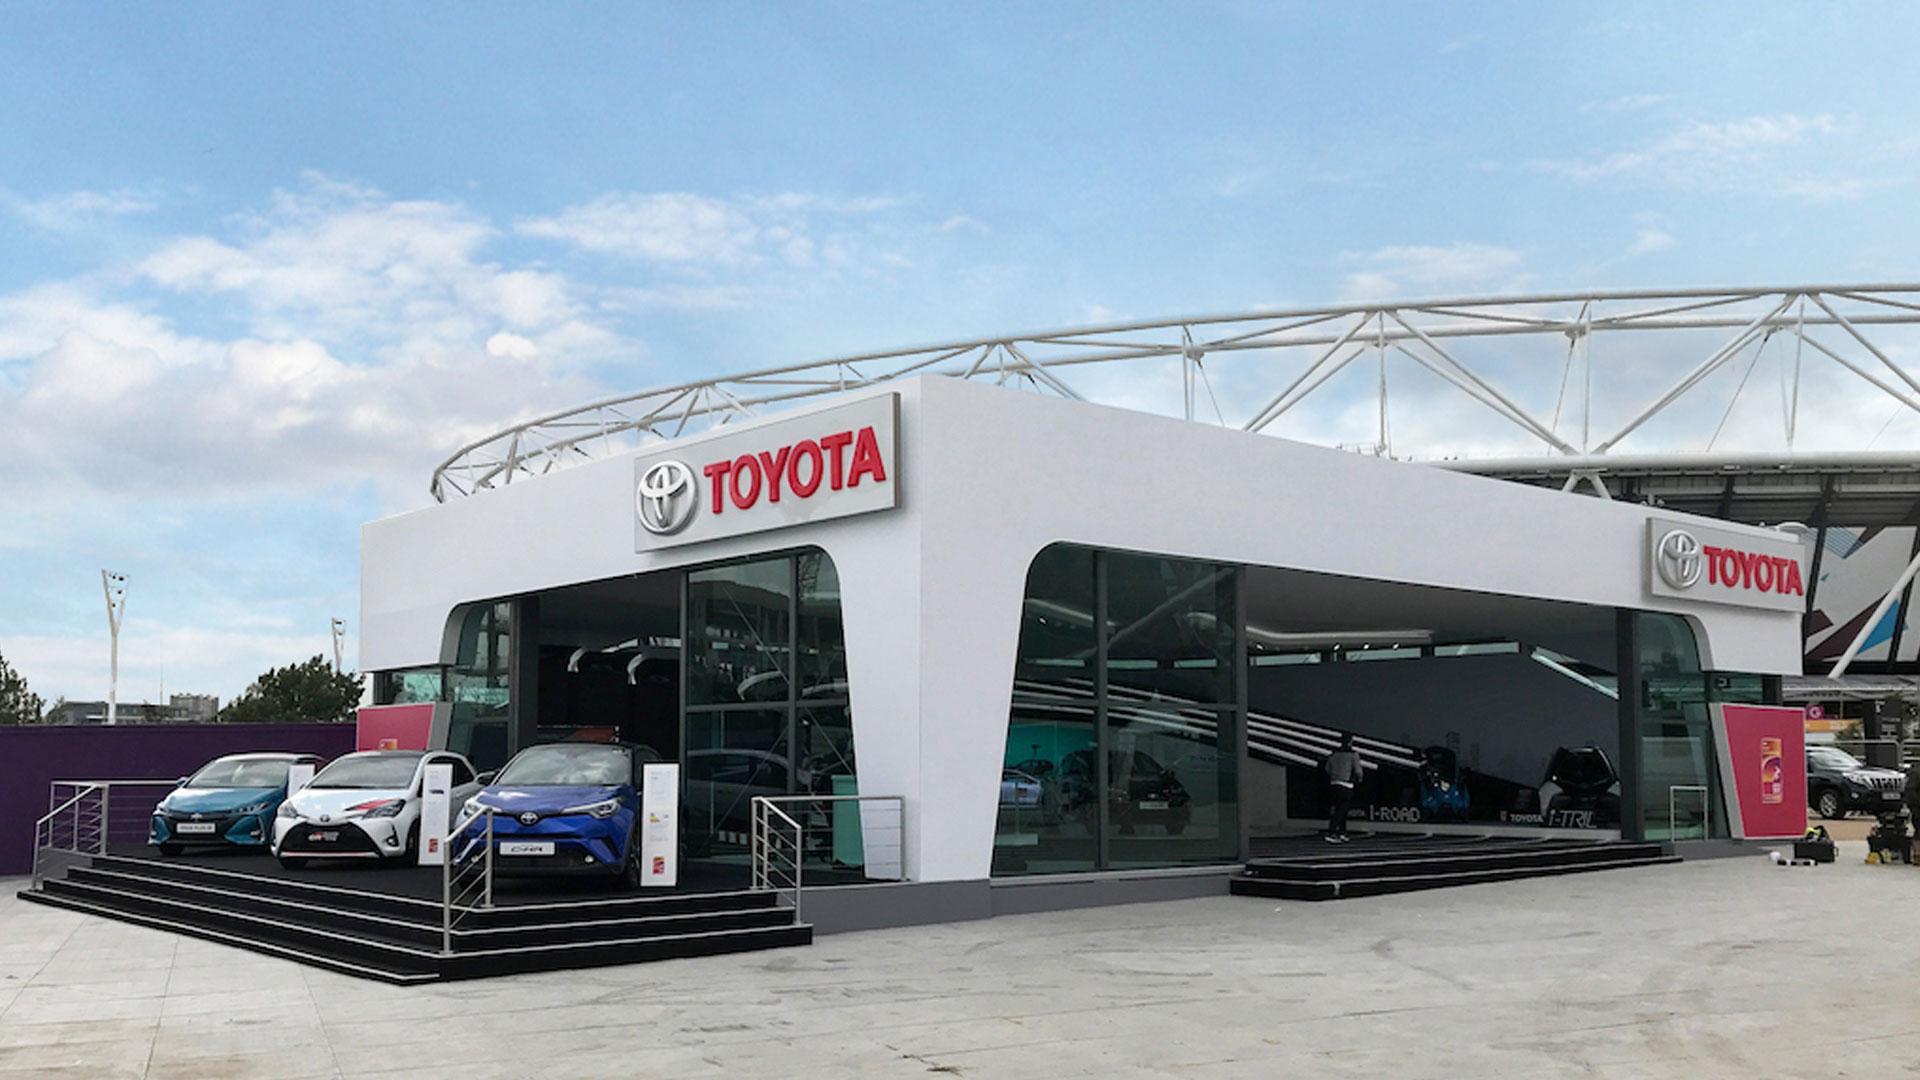 CHORD_web-images_Toyota-2_1920x1080px.jpg